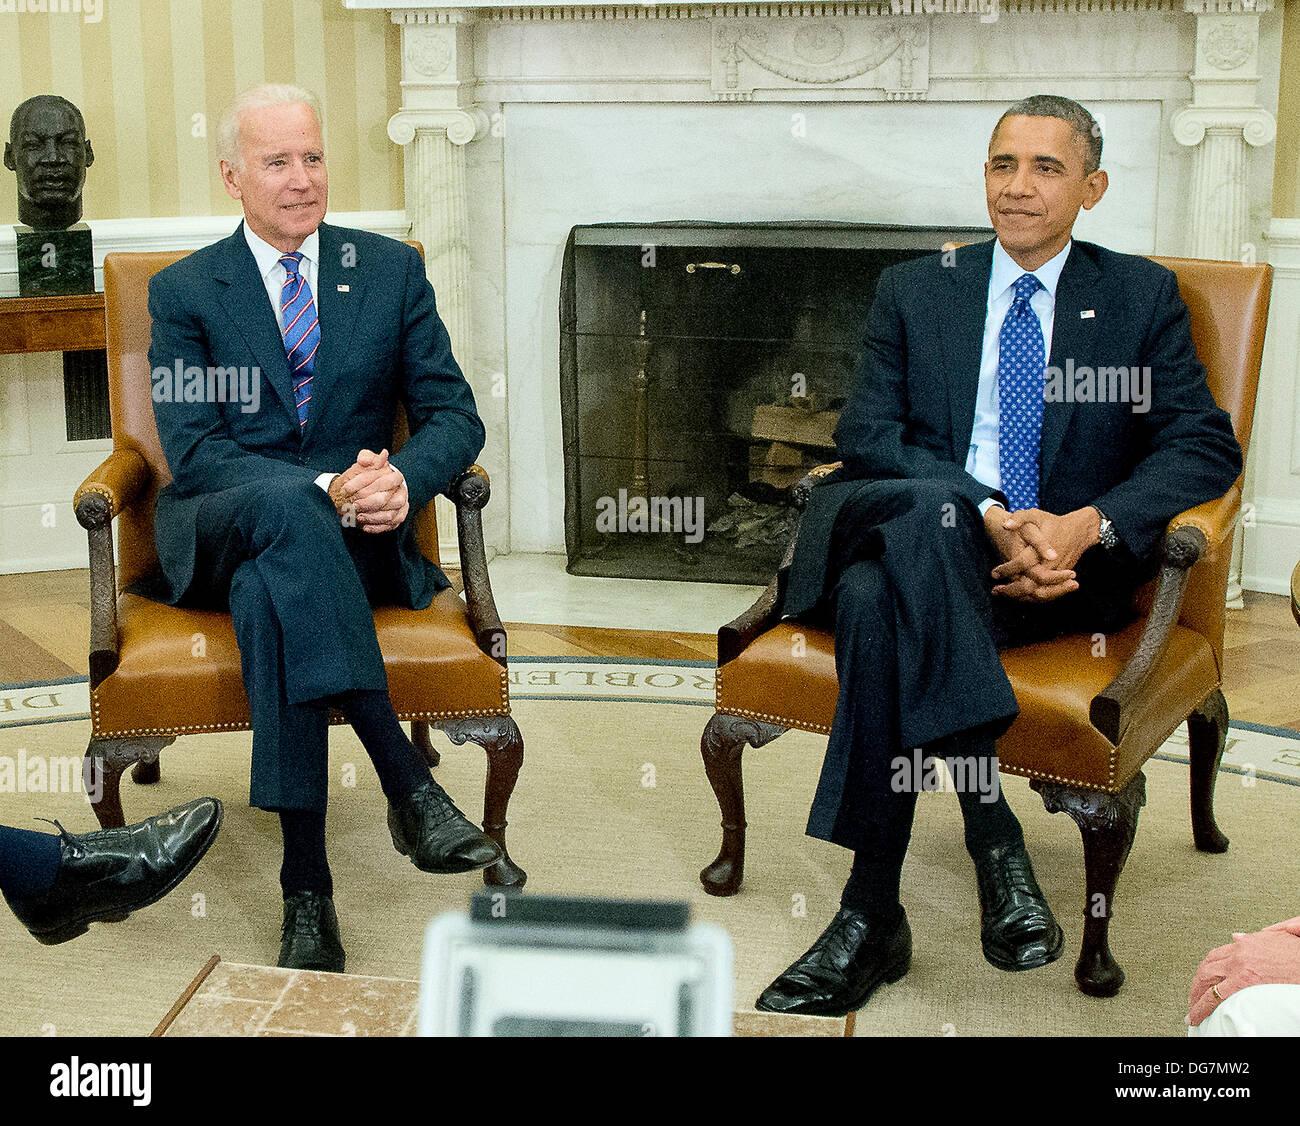 Washington, DC, USA. 15th Oct, 2013. United States President Barack Obama and U.S. Vice President Joe Biden meet Stock Photo